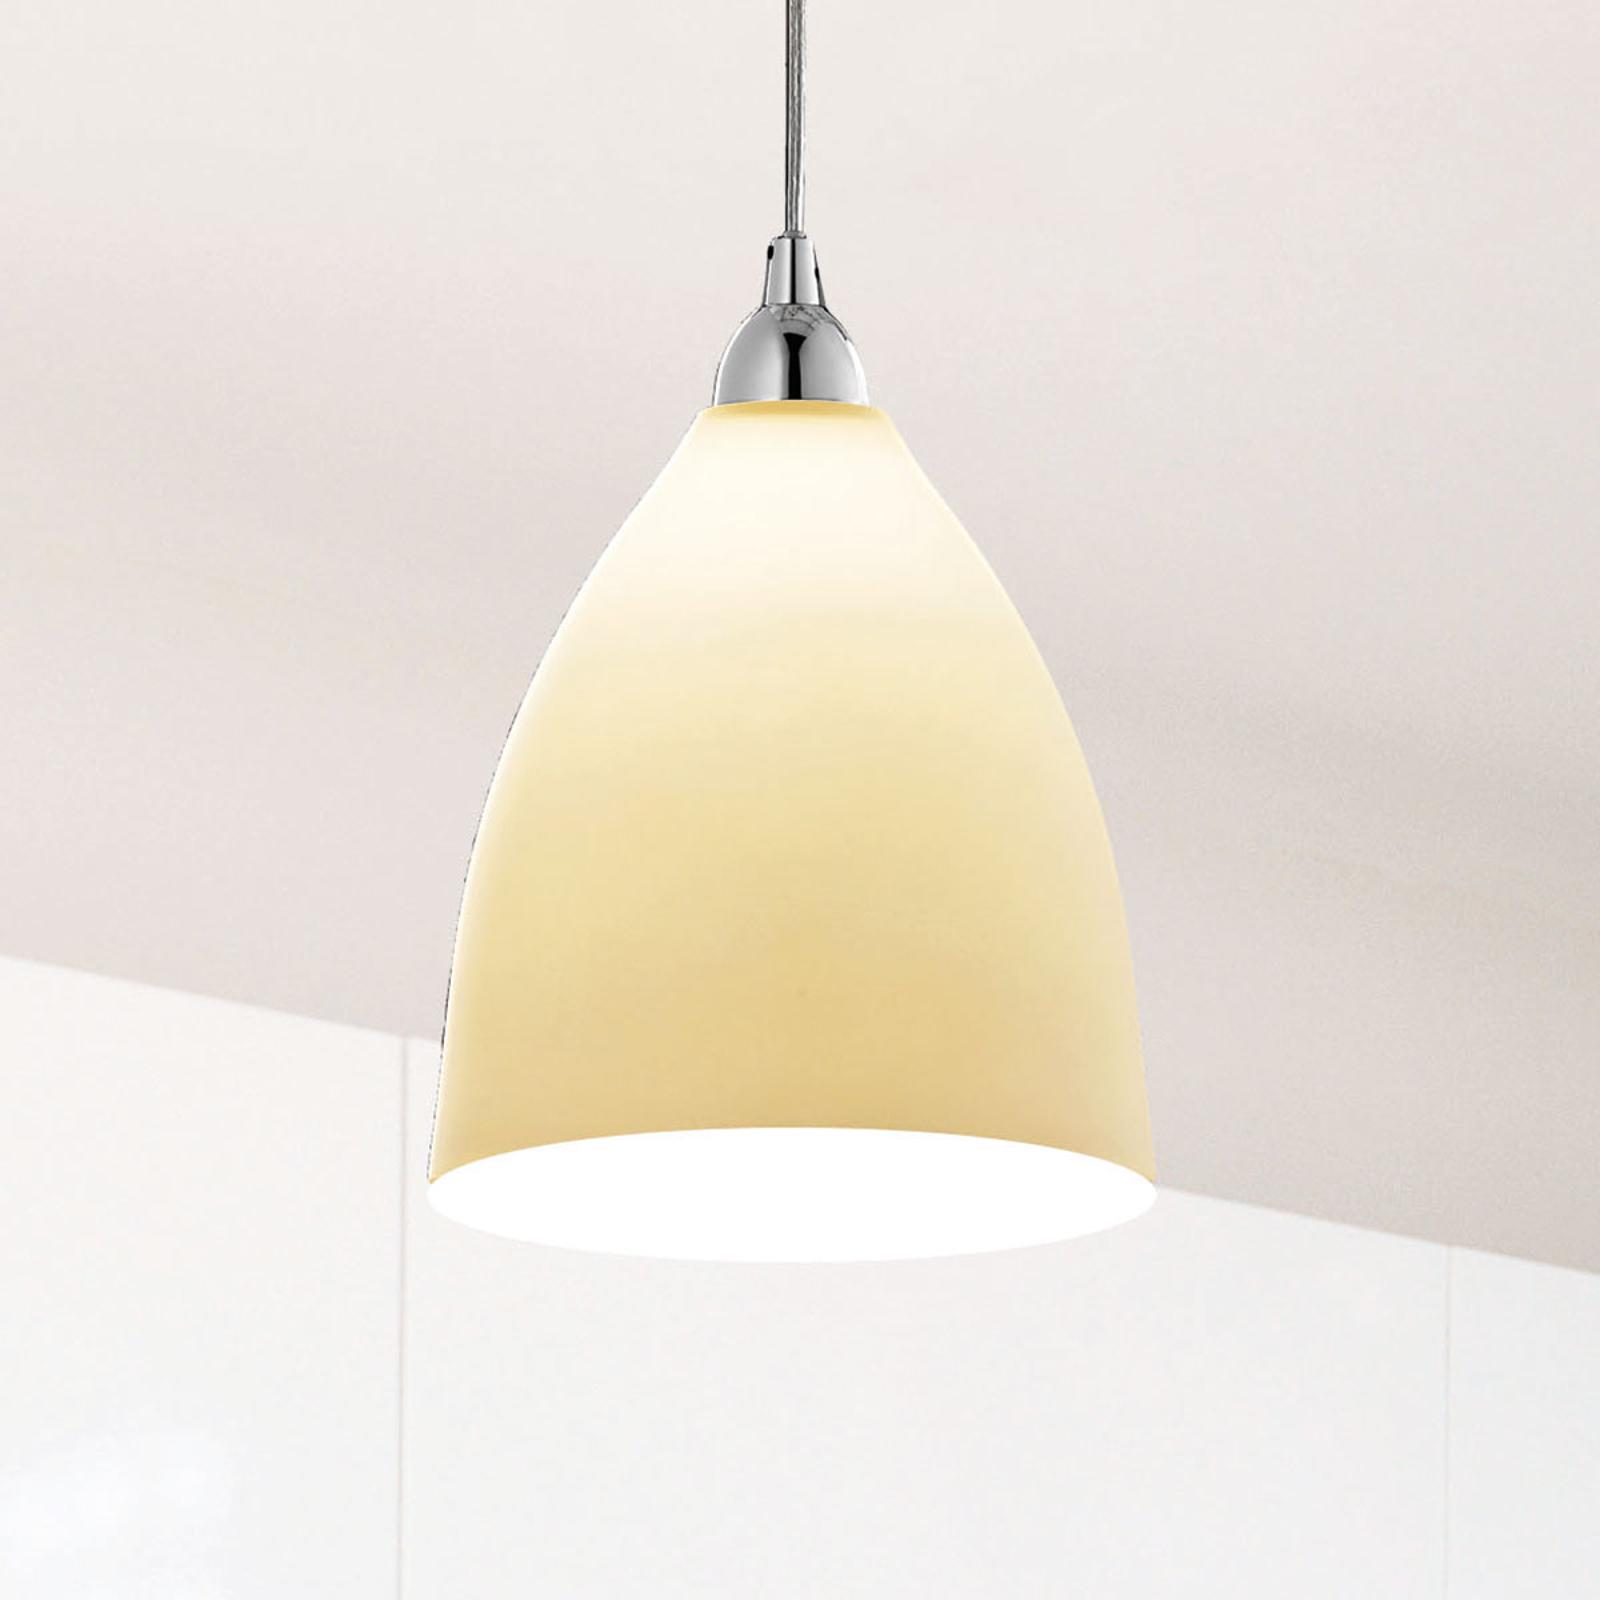 Glazen hanglamp PROVENZA, 20 cm, amberkleurig